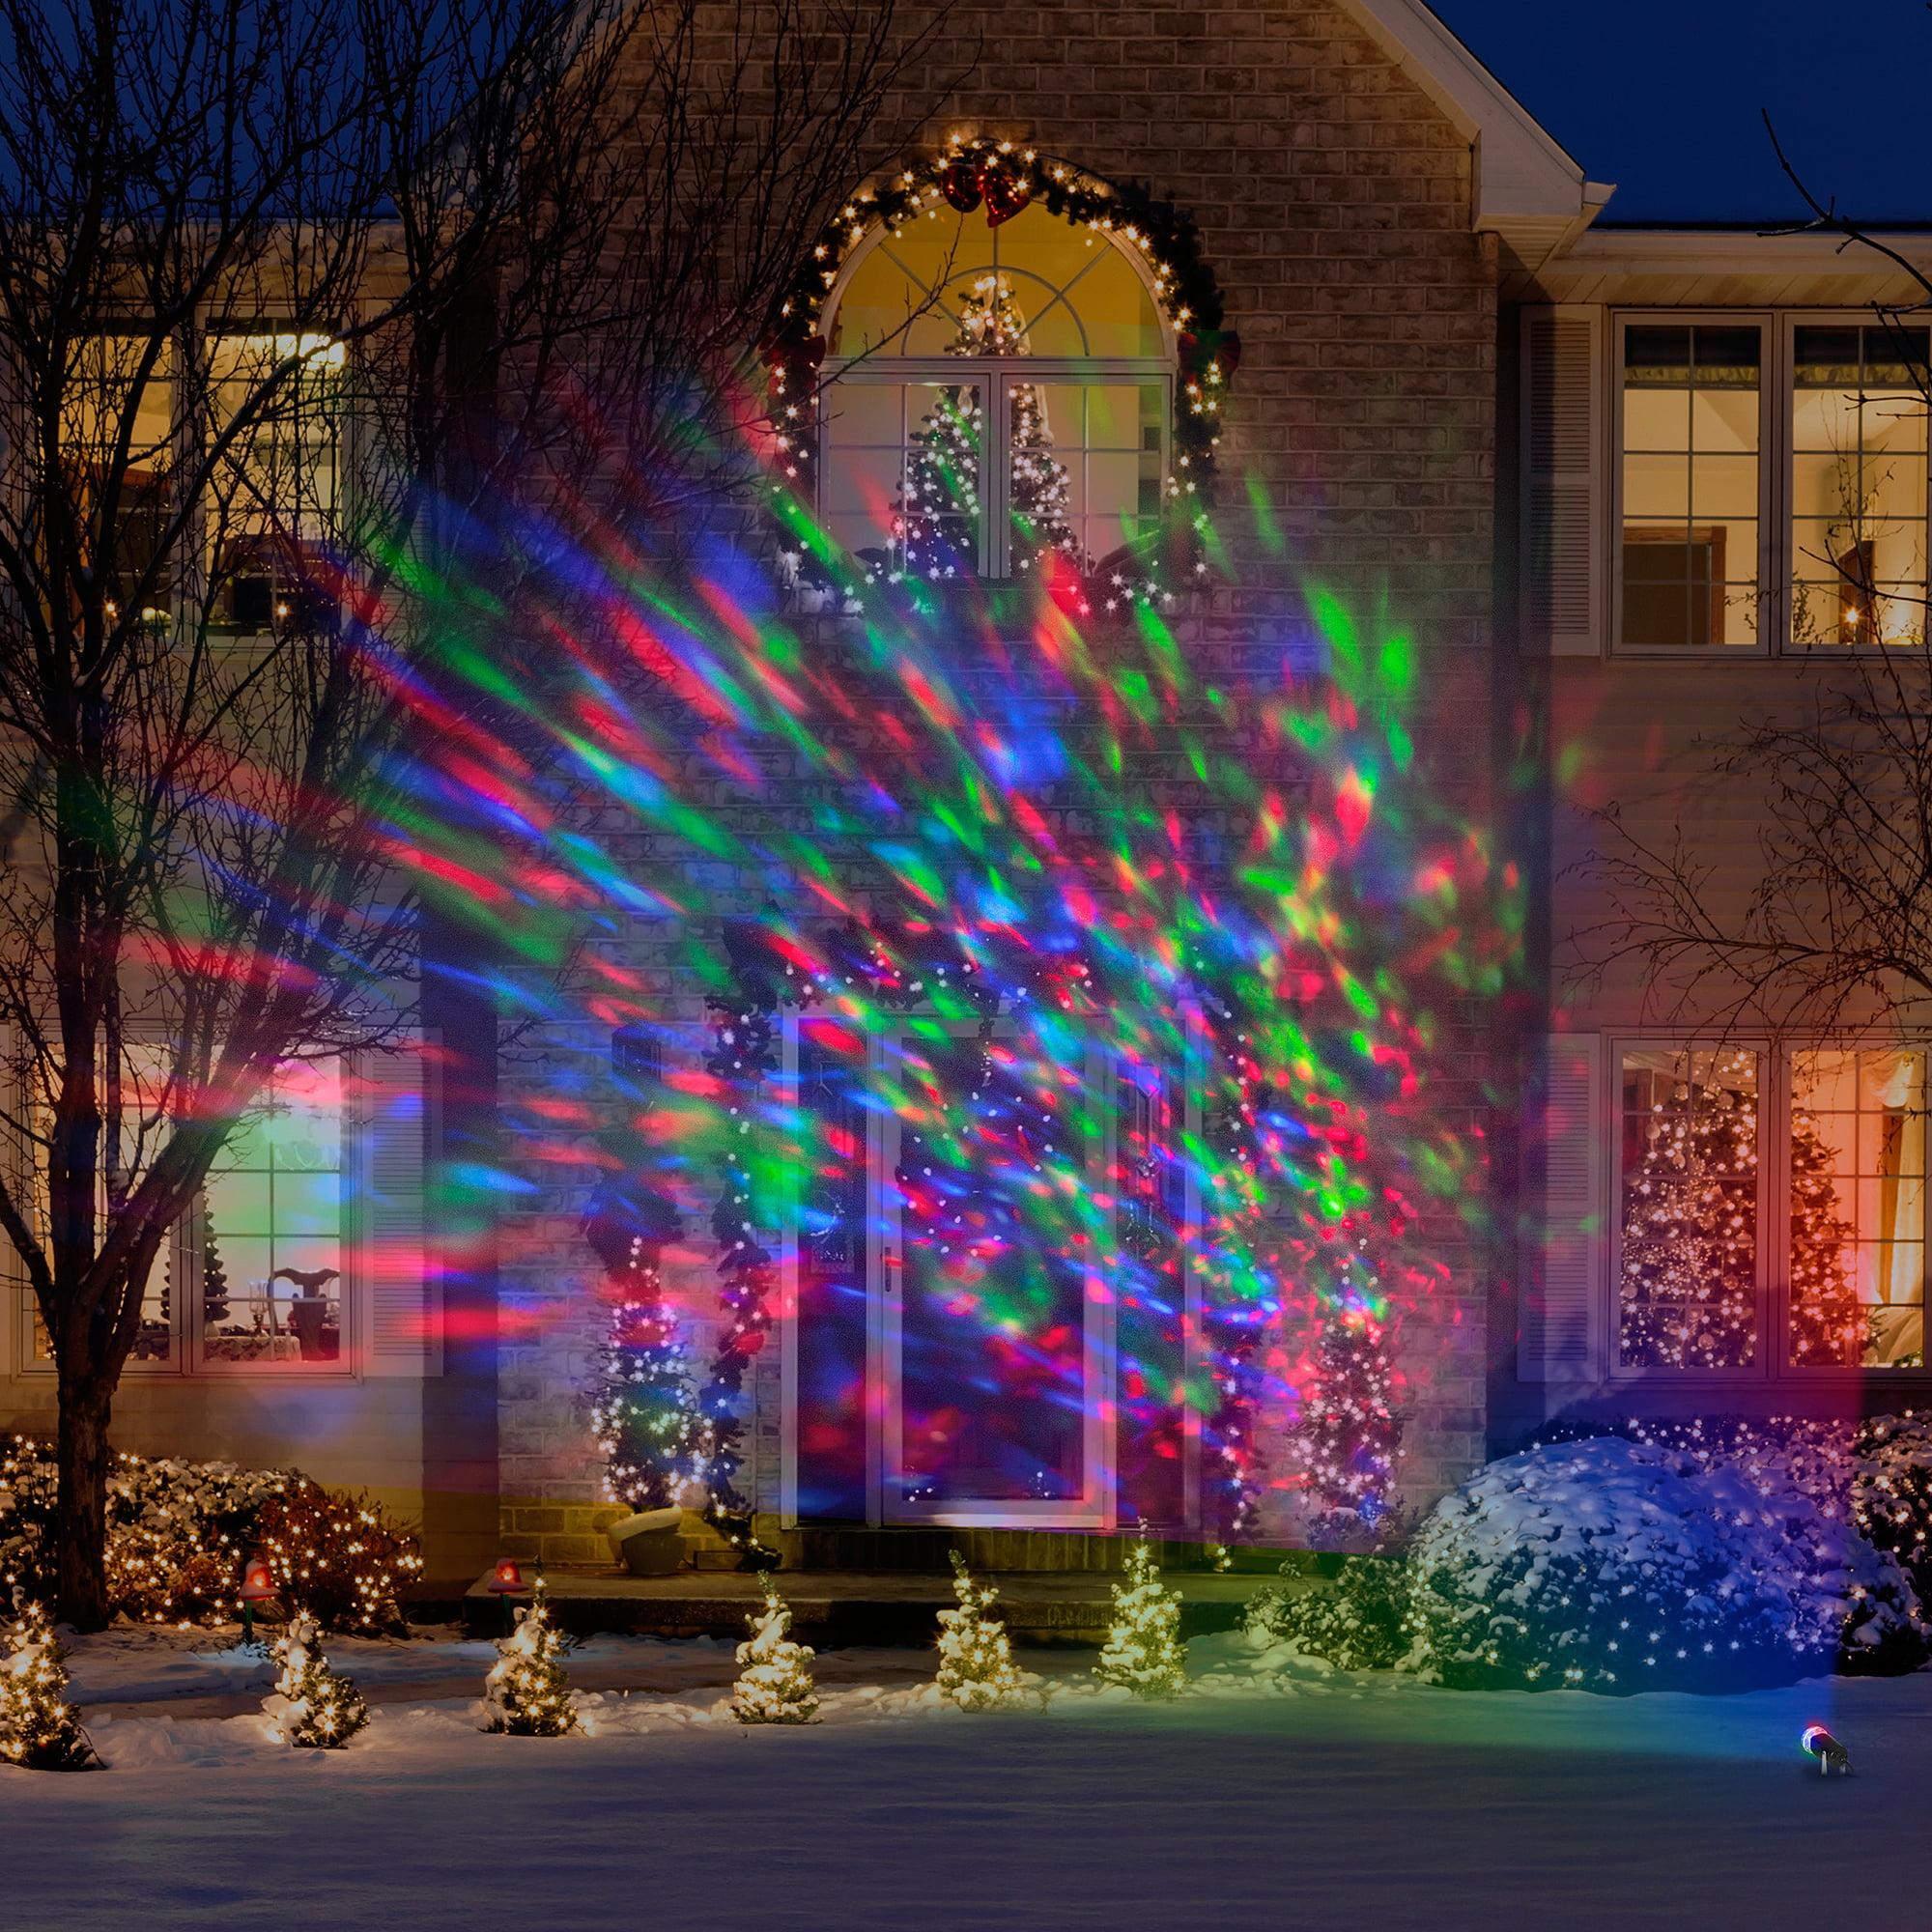 Lightshow Kaleidoscope Multi-Colored Christmas Lights